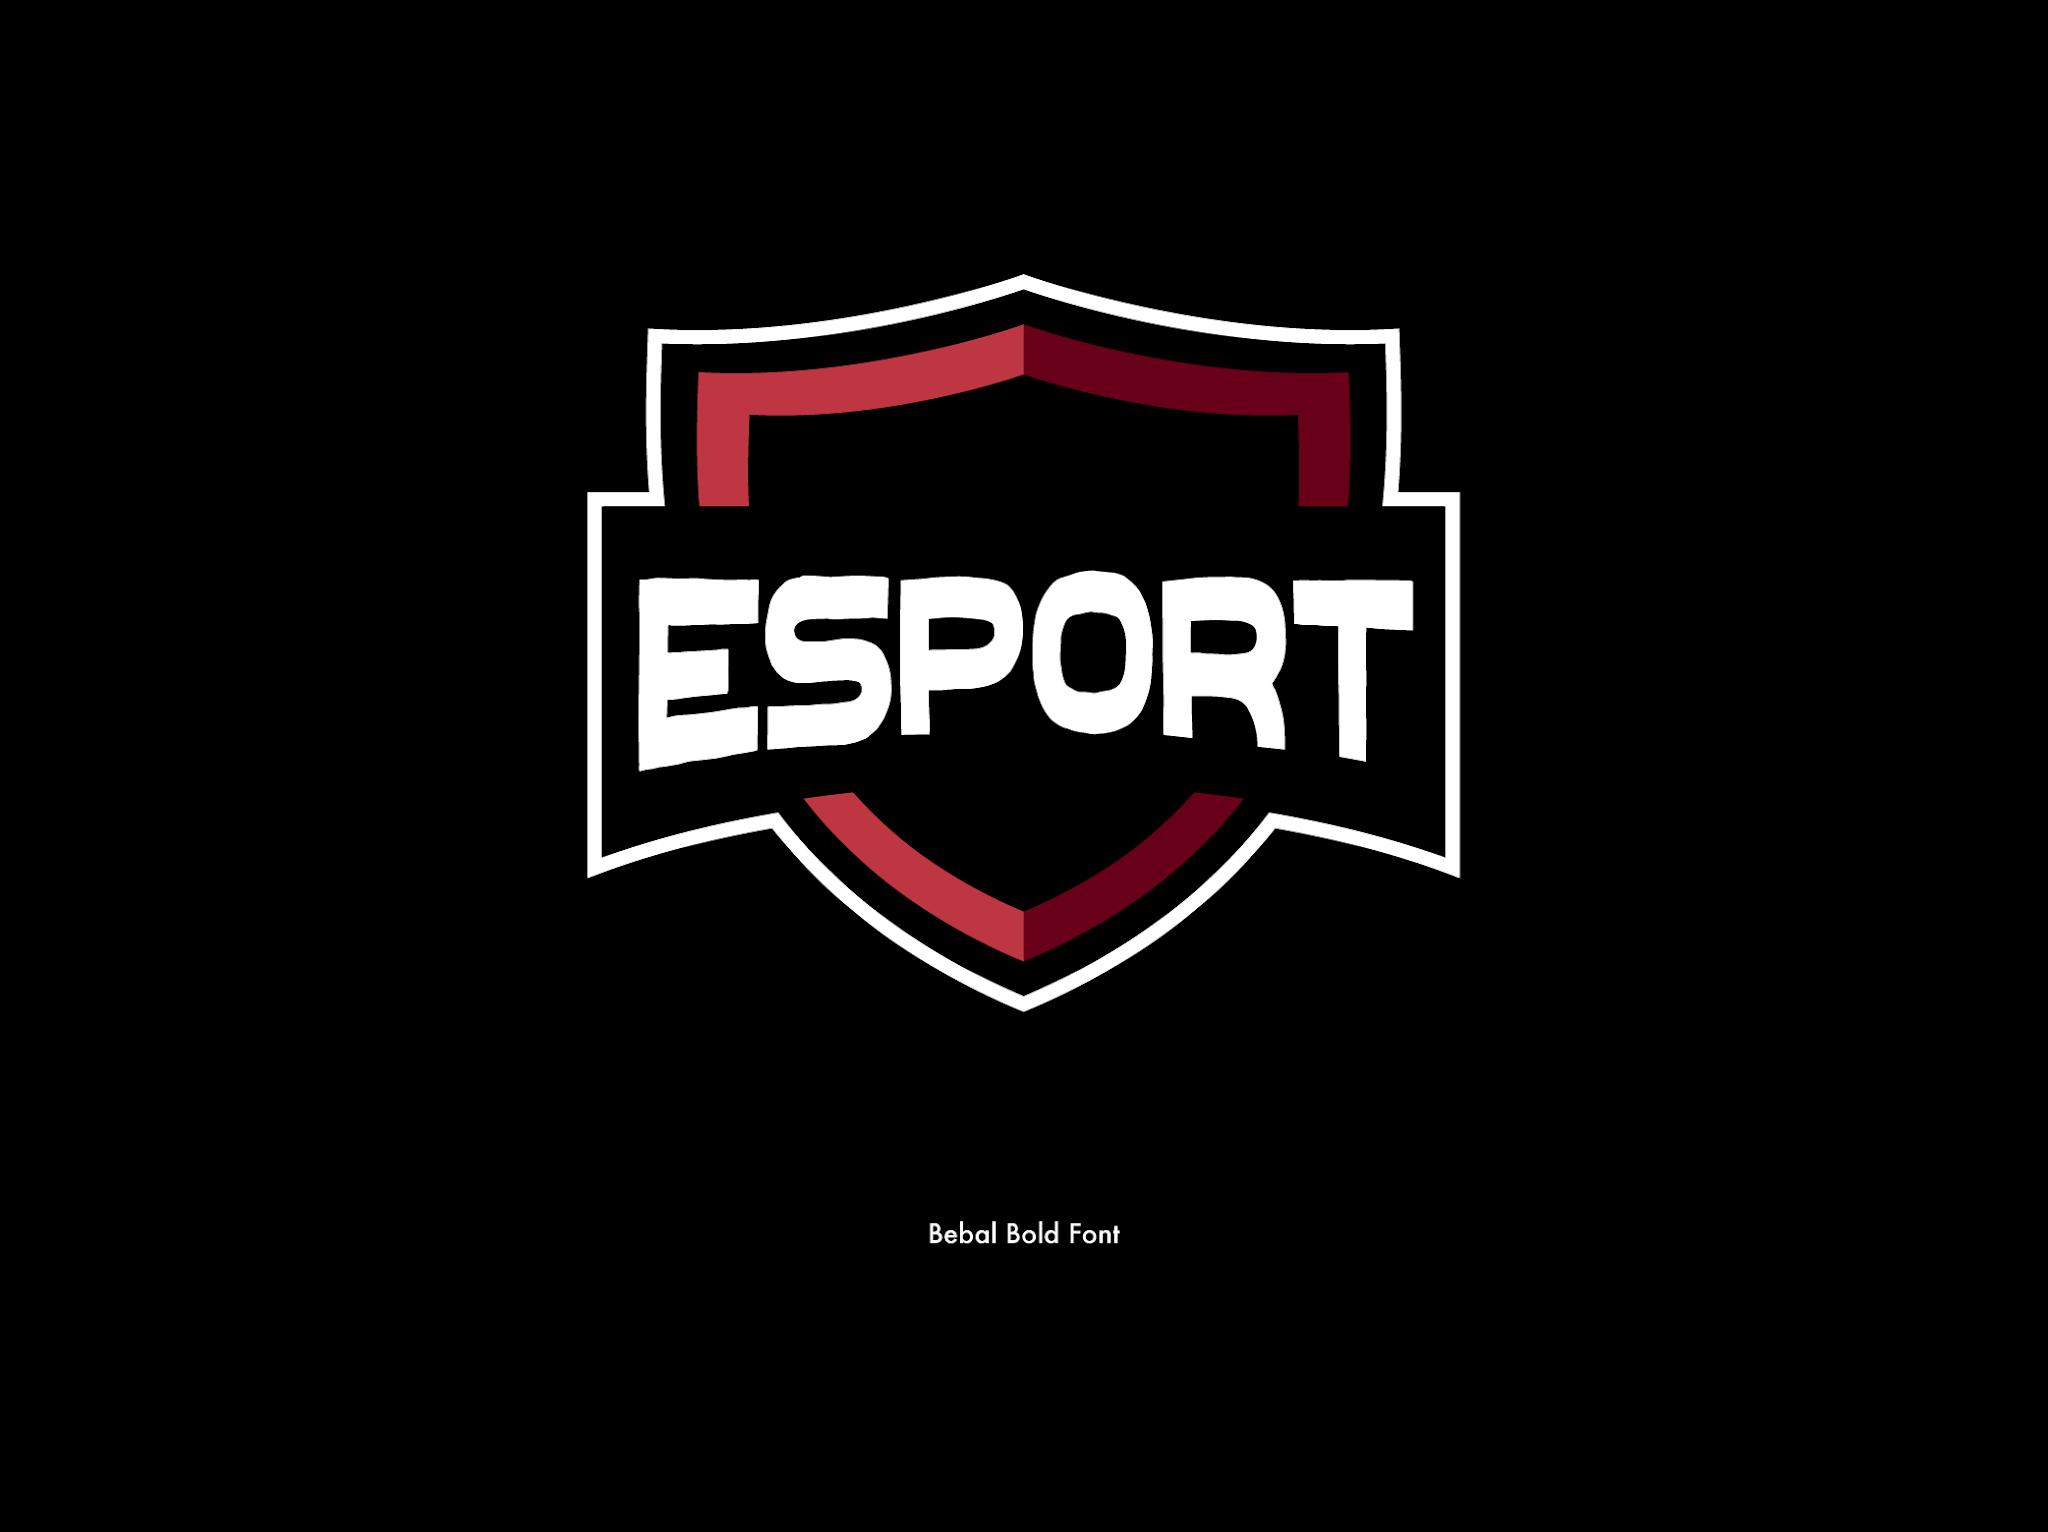 Best Free 28 Font For Esport Logo Design Part 1